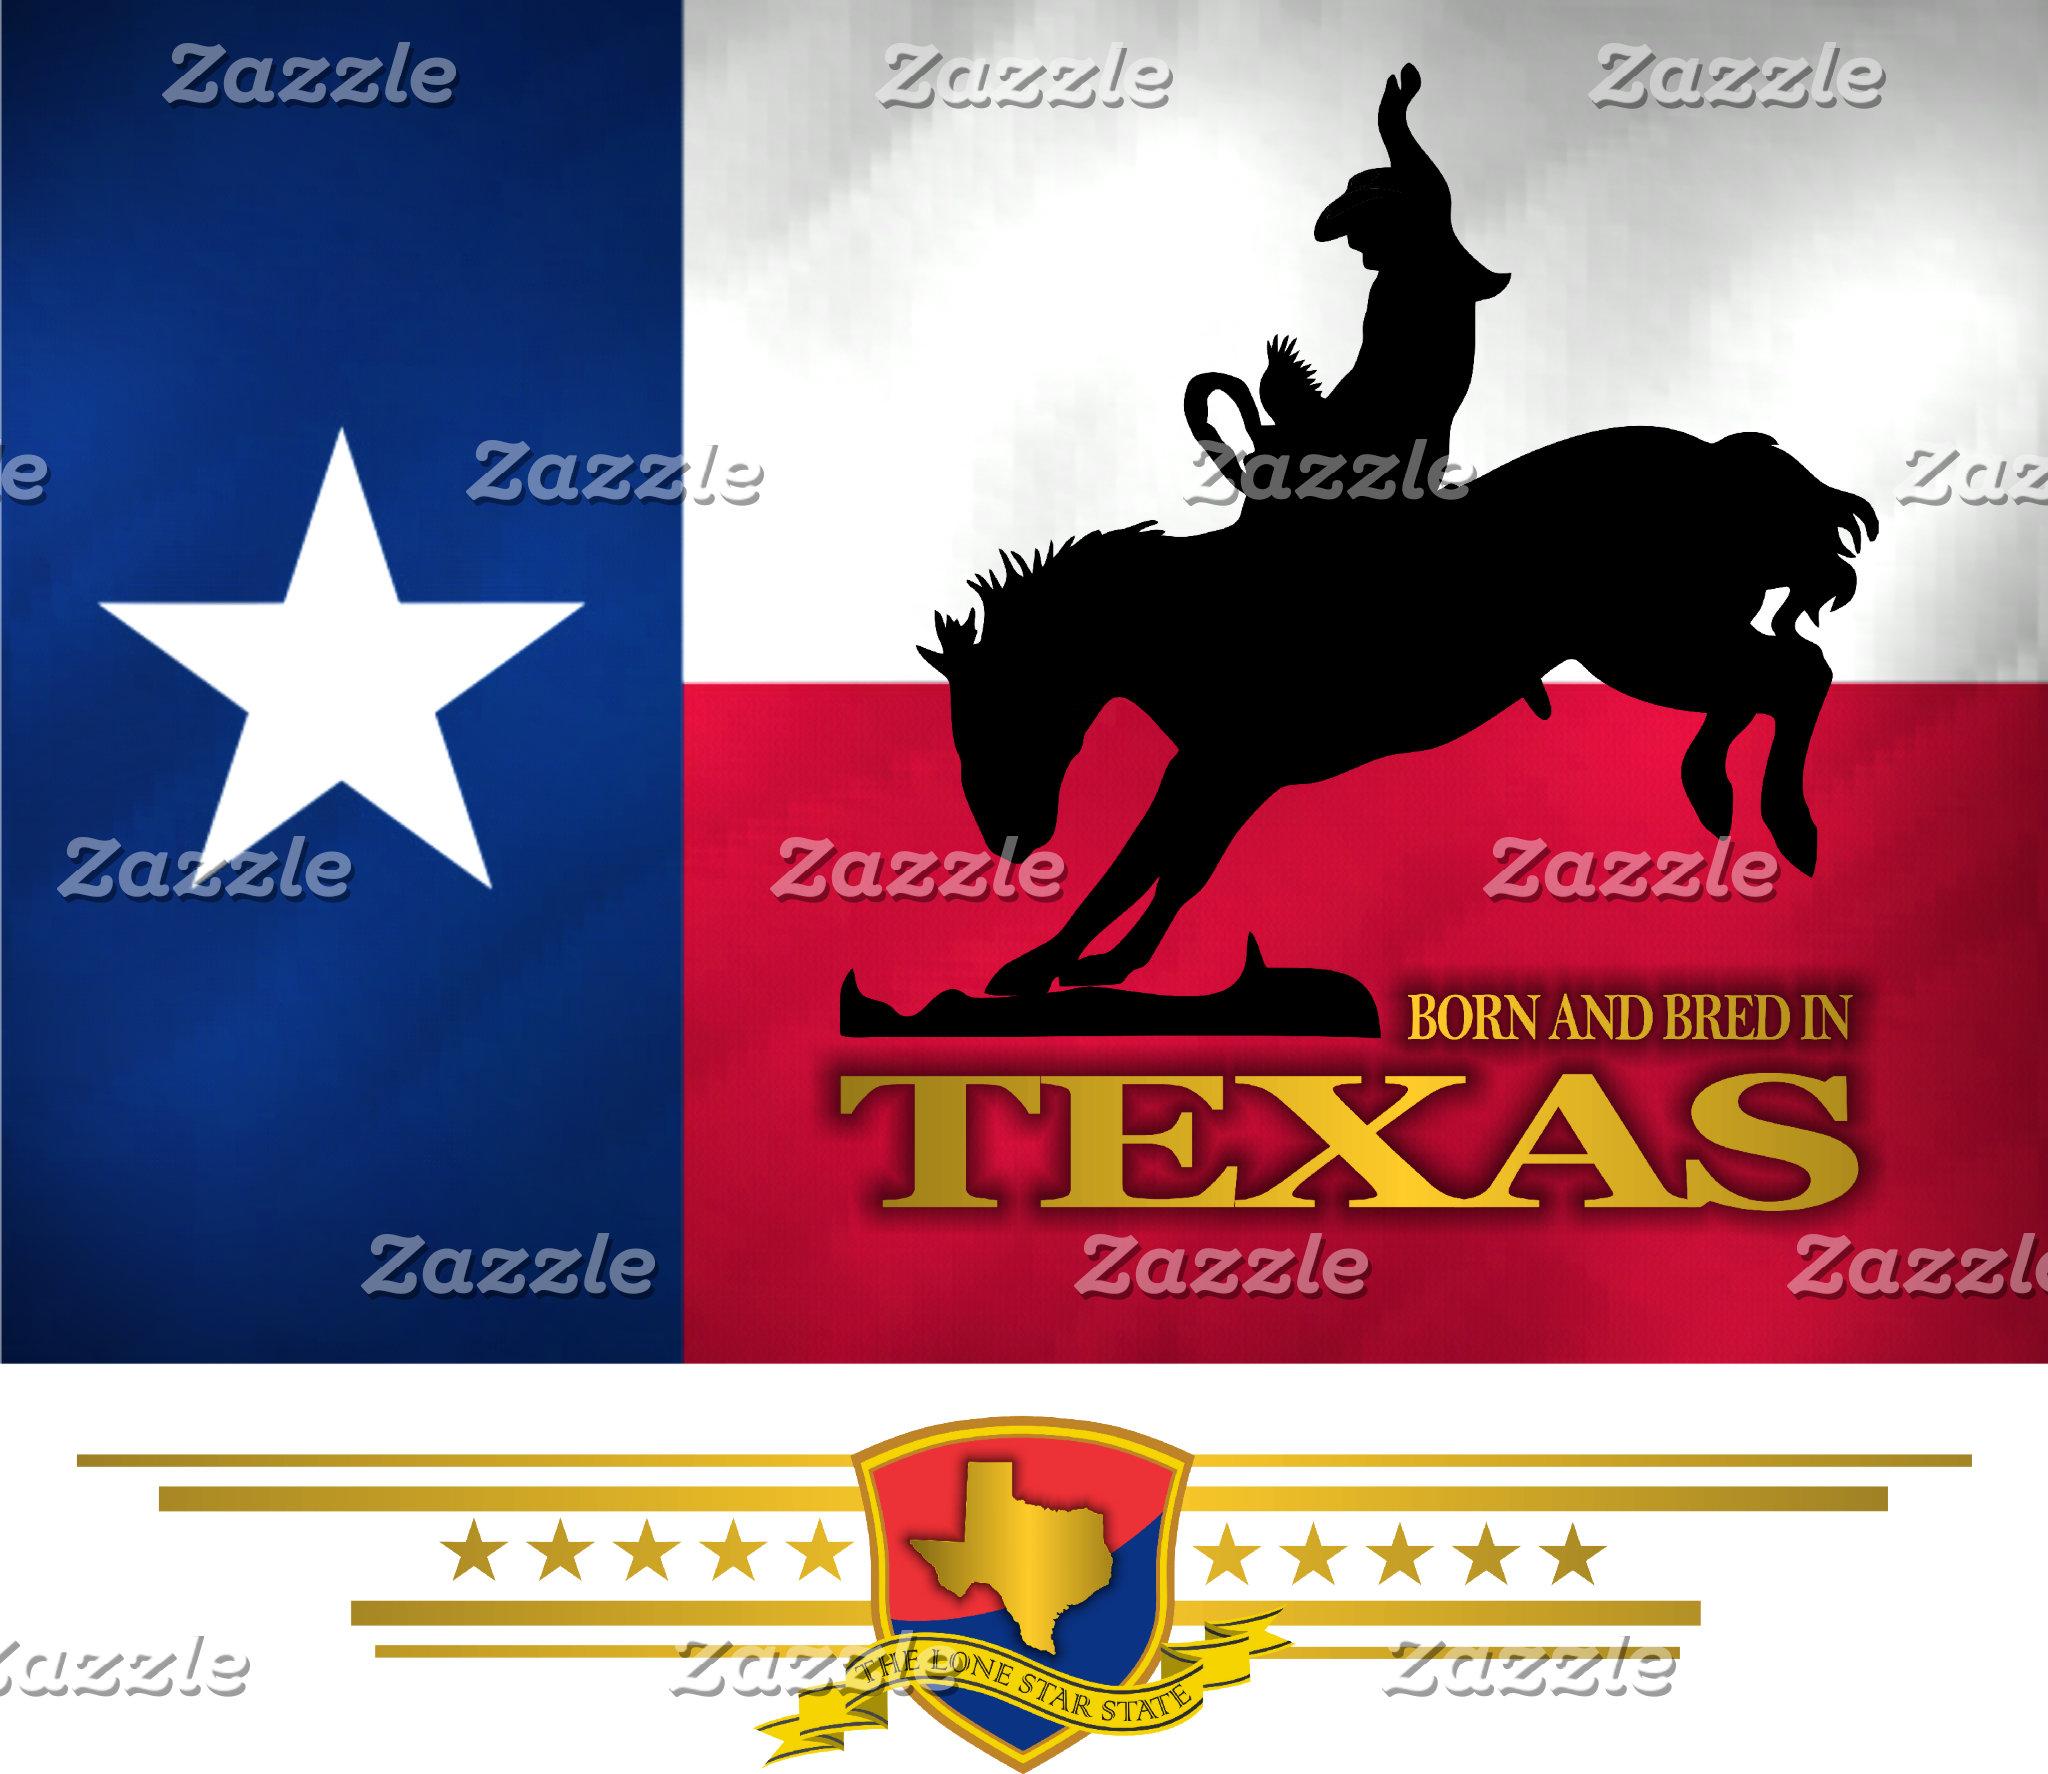 Texas Born & Bred